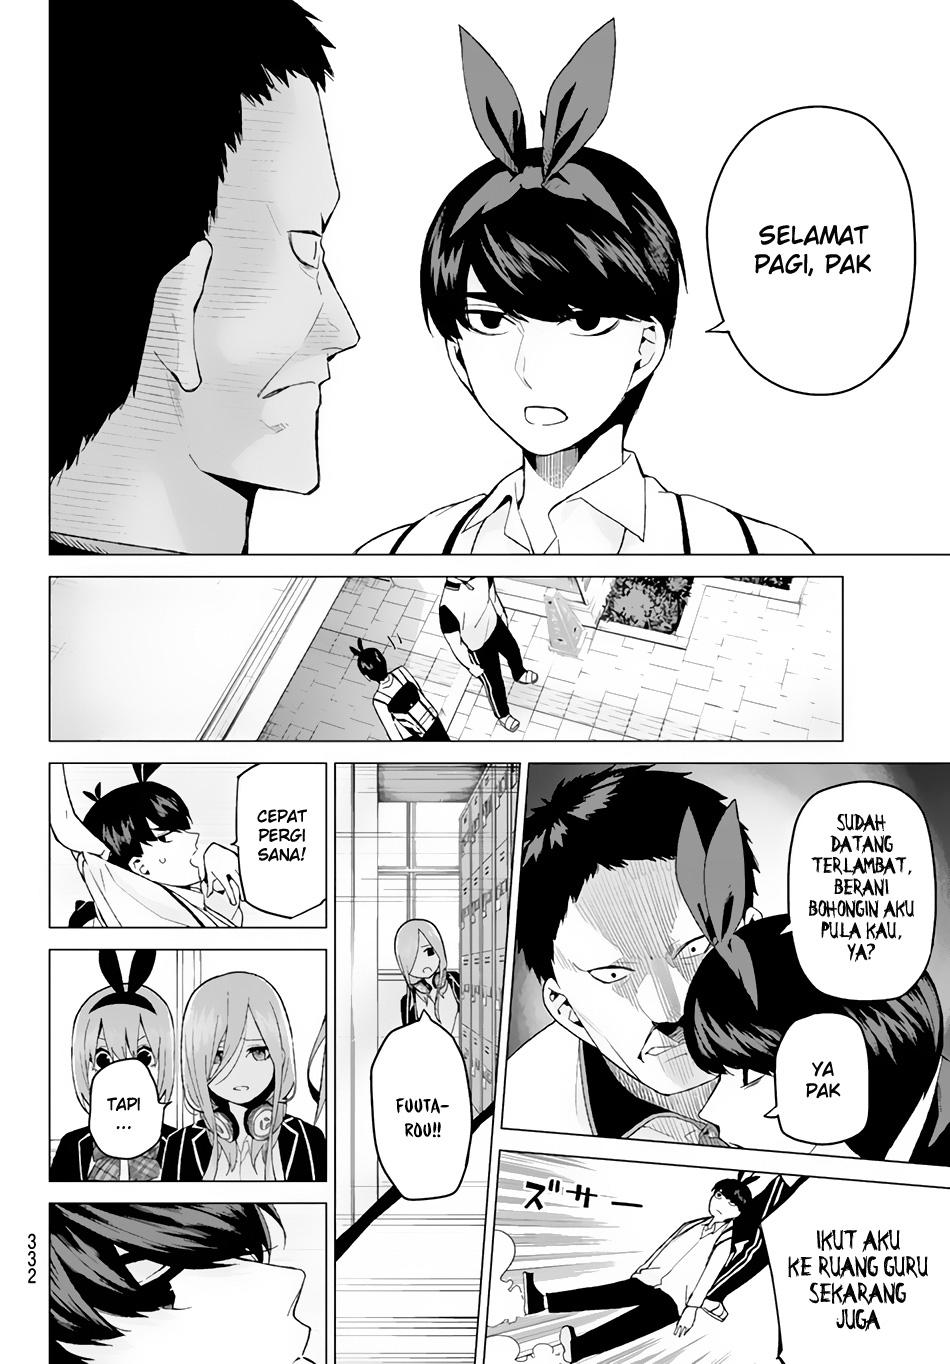 Baca Komik Go-Toubun No Hanayome Chapter 19 Bahasa Indonesia